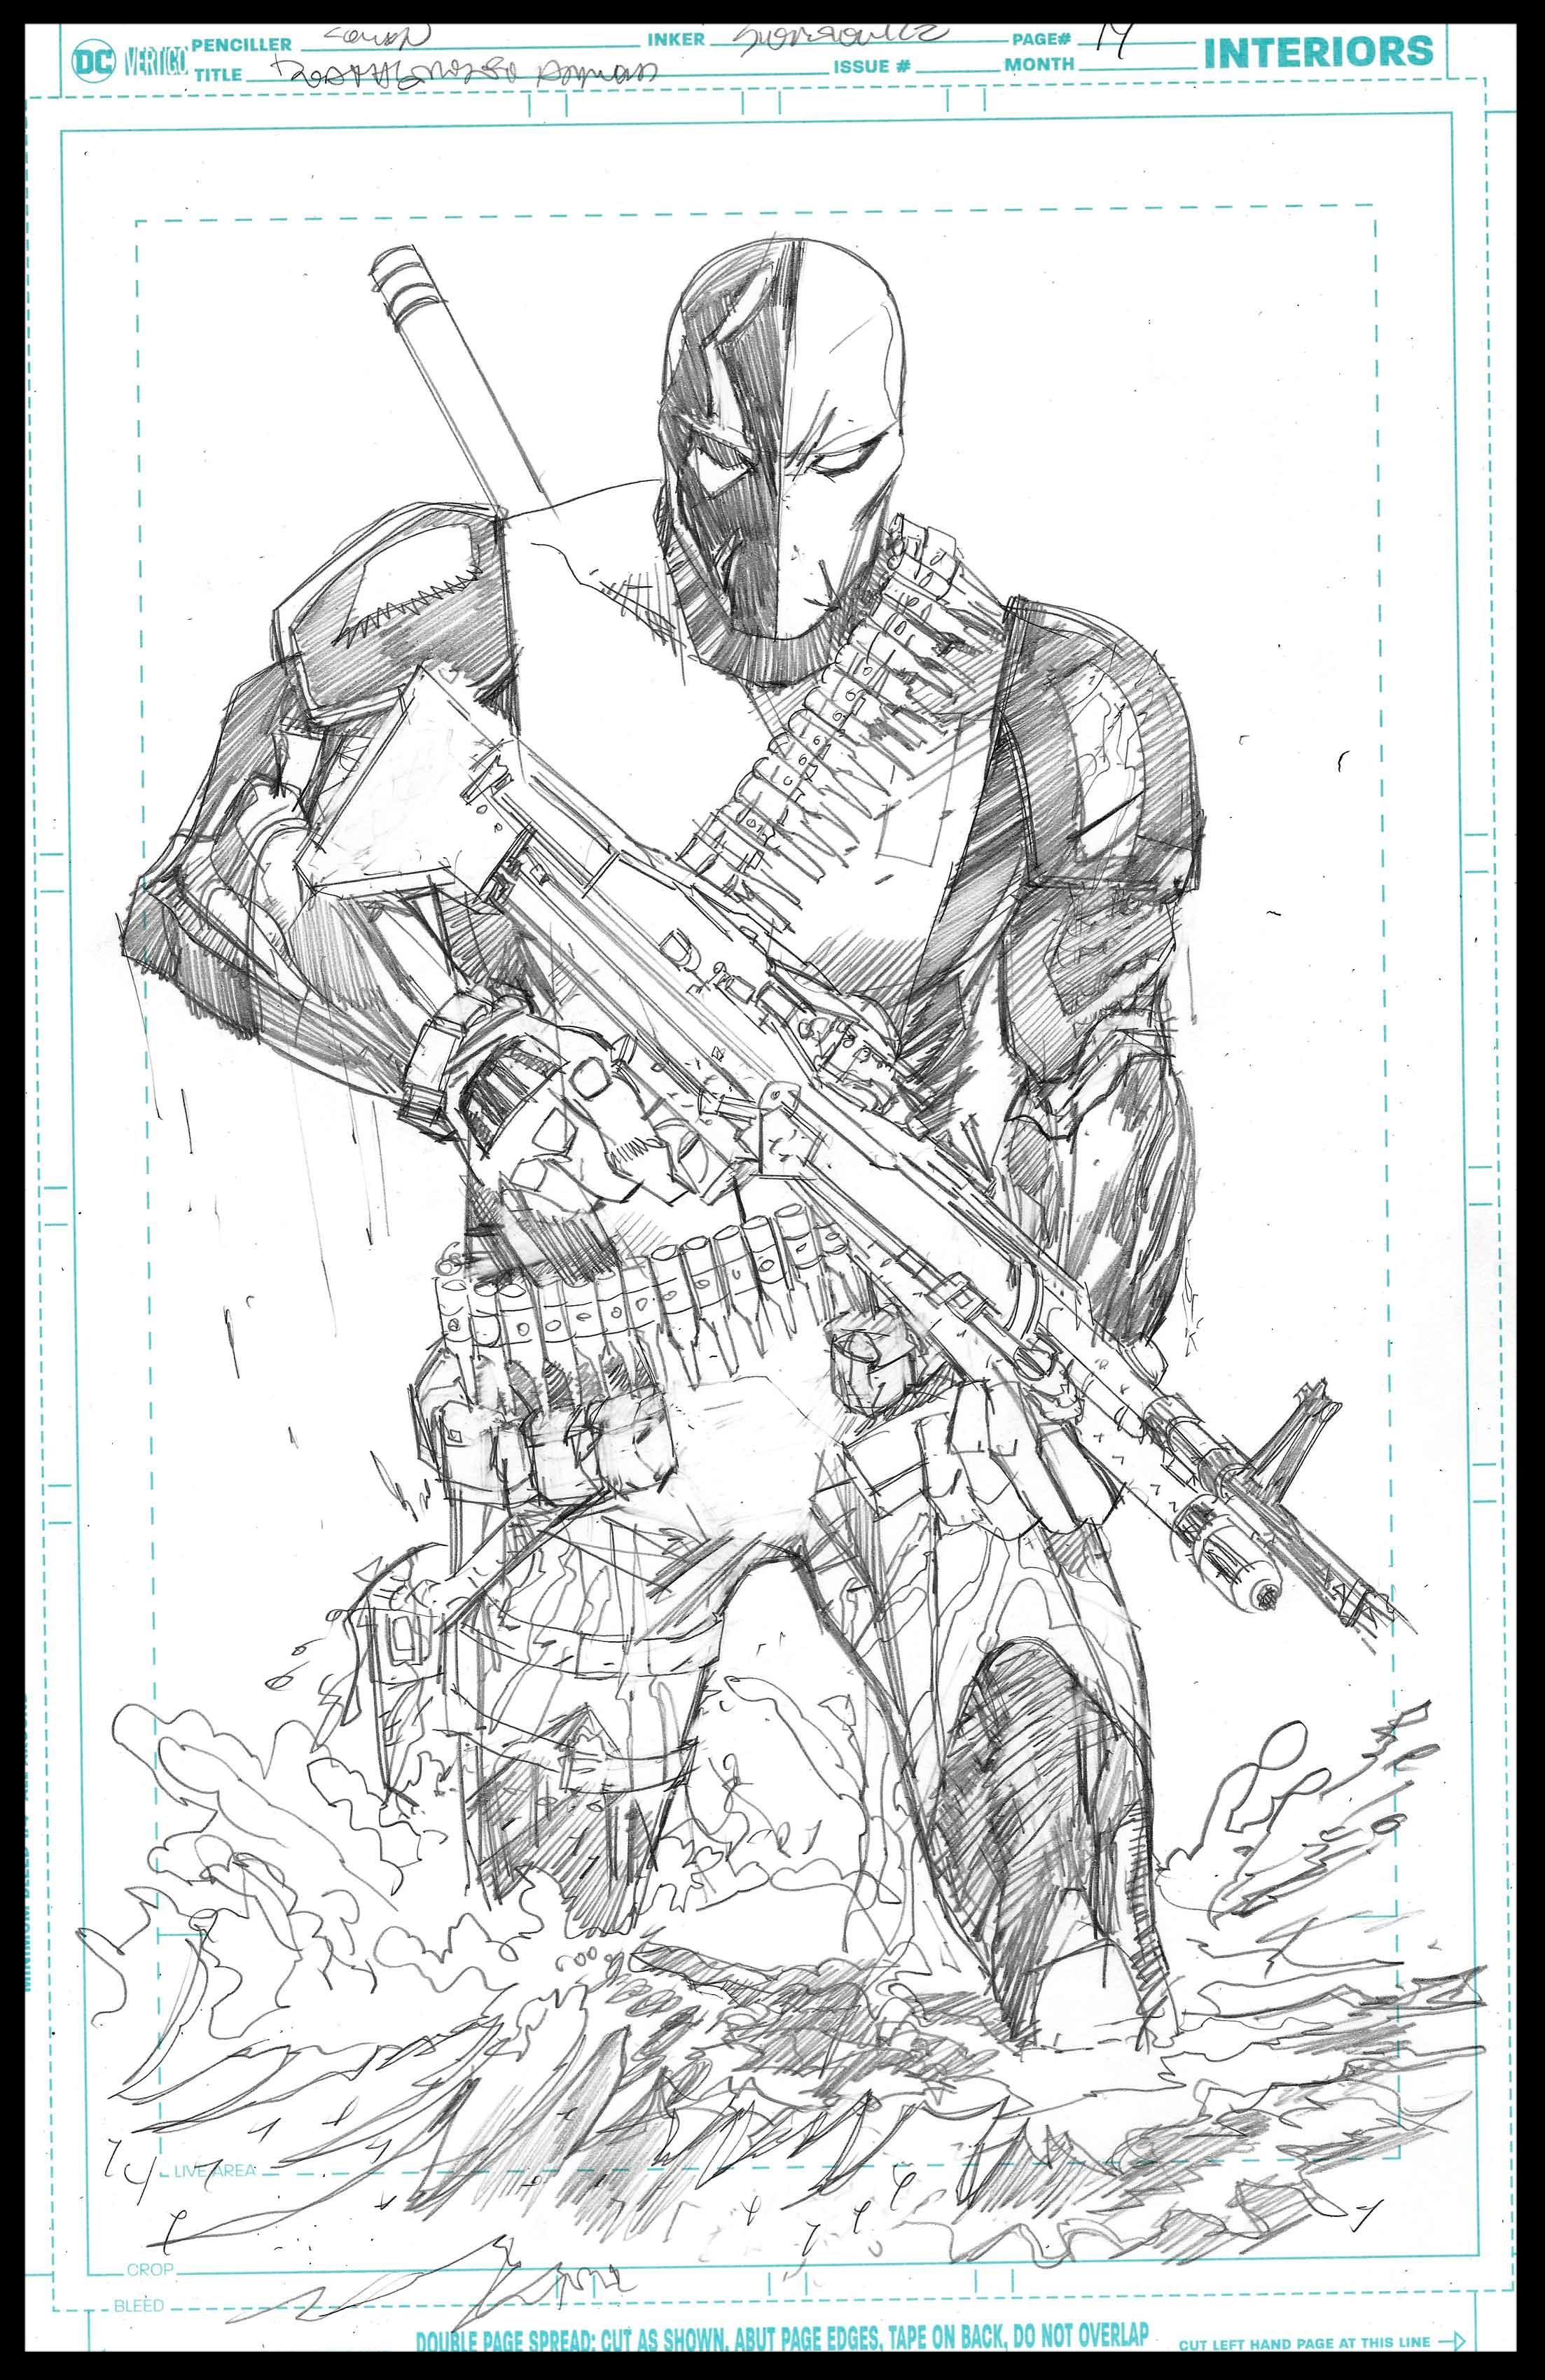 Deathstroke Annual - Page 14 - Pencils